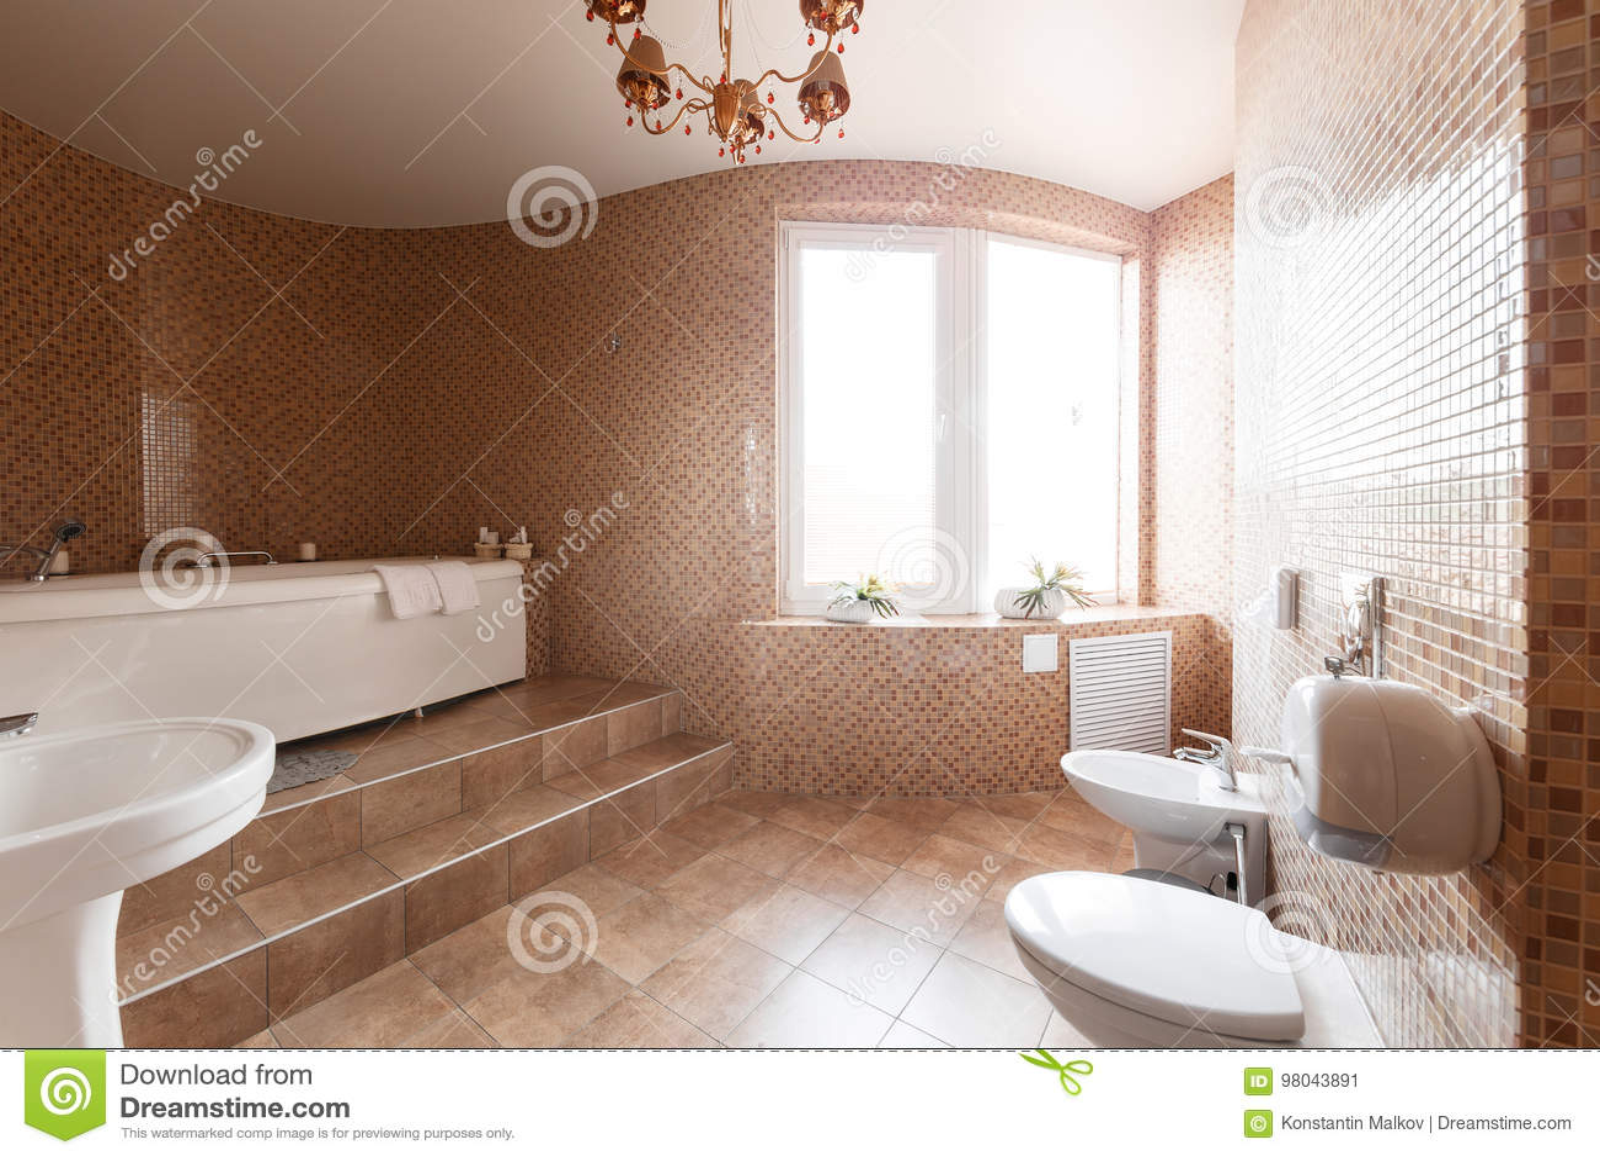 Moderne luxebadkamers met badkuip en venster binnenlands ontwerp